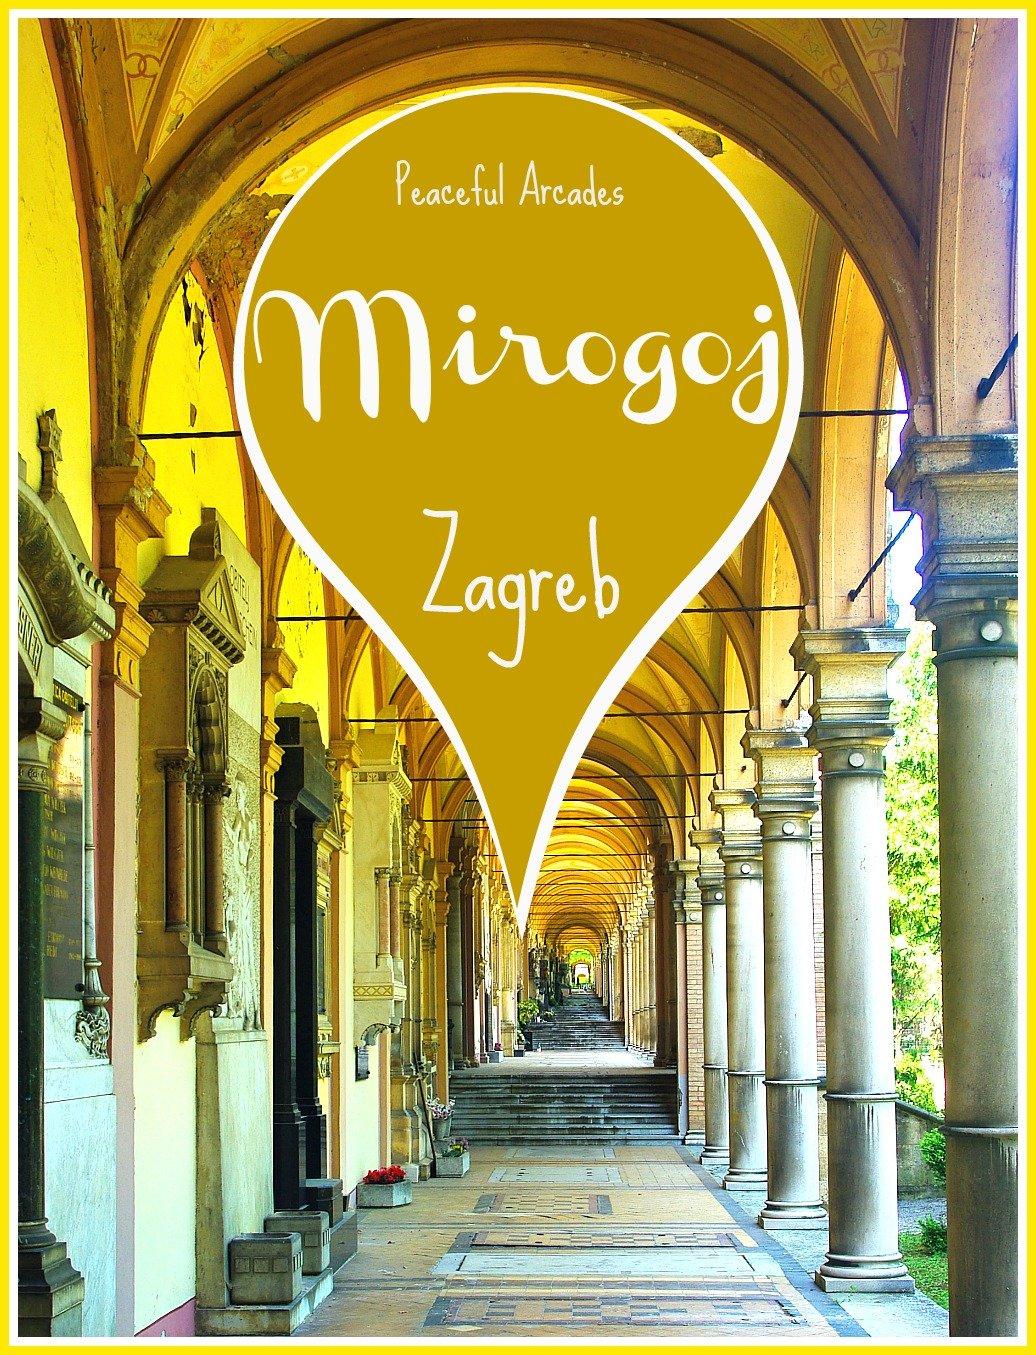 Peaceful Arcades of Mirogoj Cemetery Zagreb